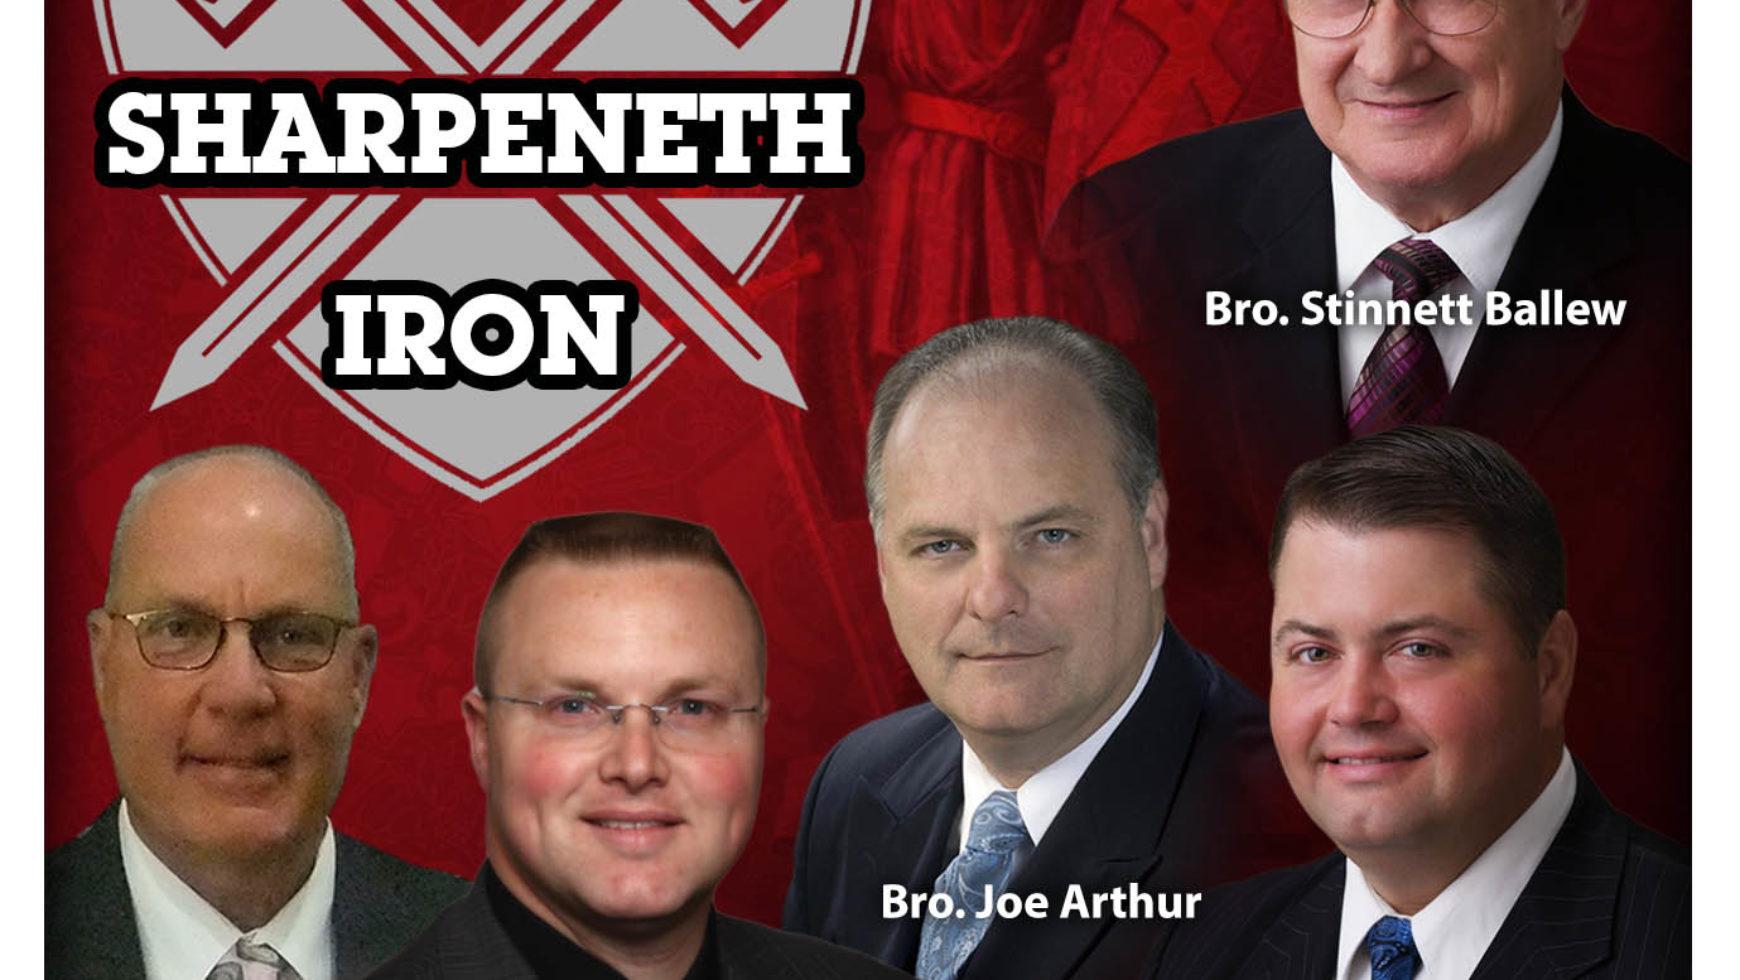 Area Meeting: Revival – Iron Sharpeneth Iron – Anchor of Hope Baptist Church – Rossville, Ga